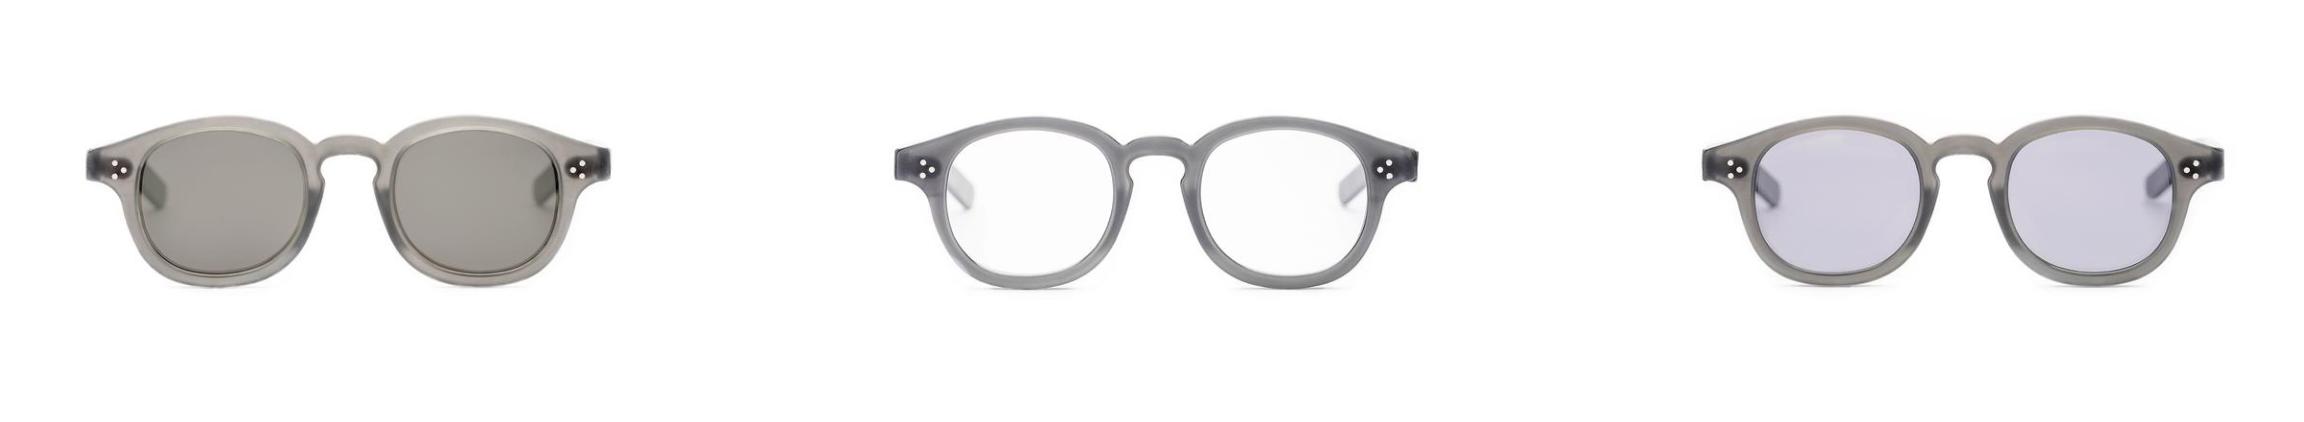 The First Circular Economy Eyewear from Flint